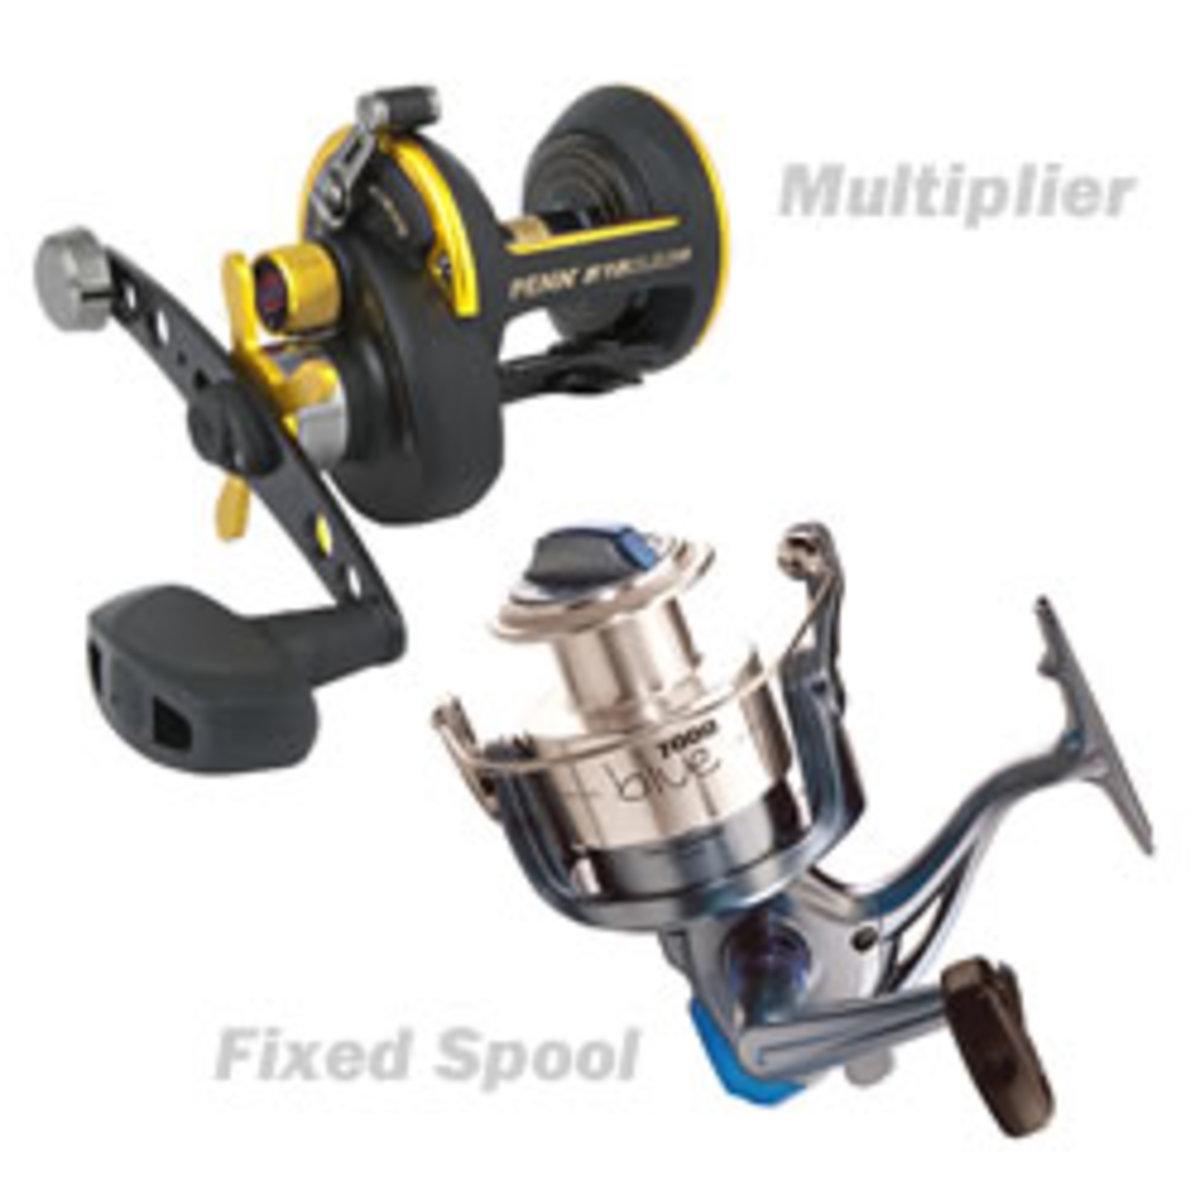 Multiplier or Fixed Spool Reel?